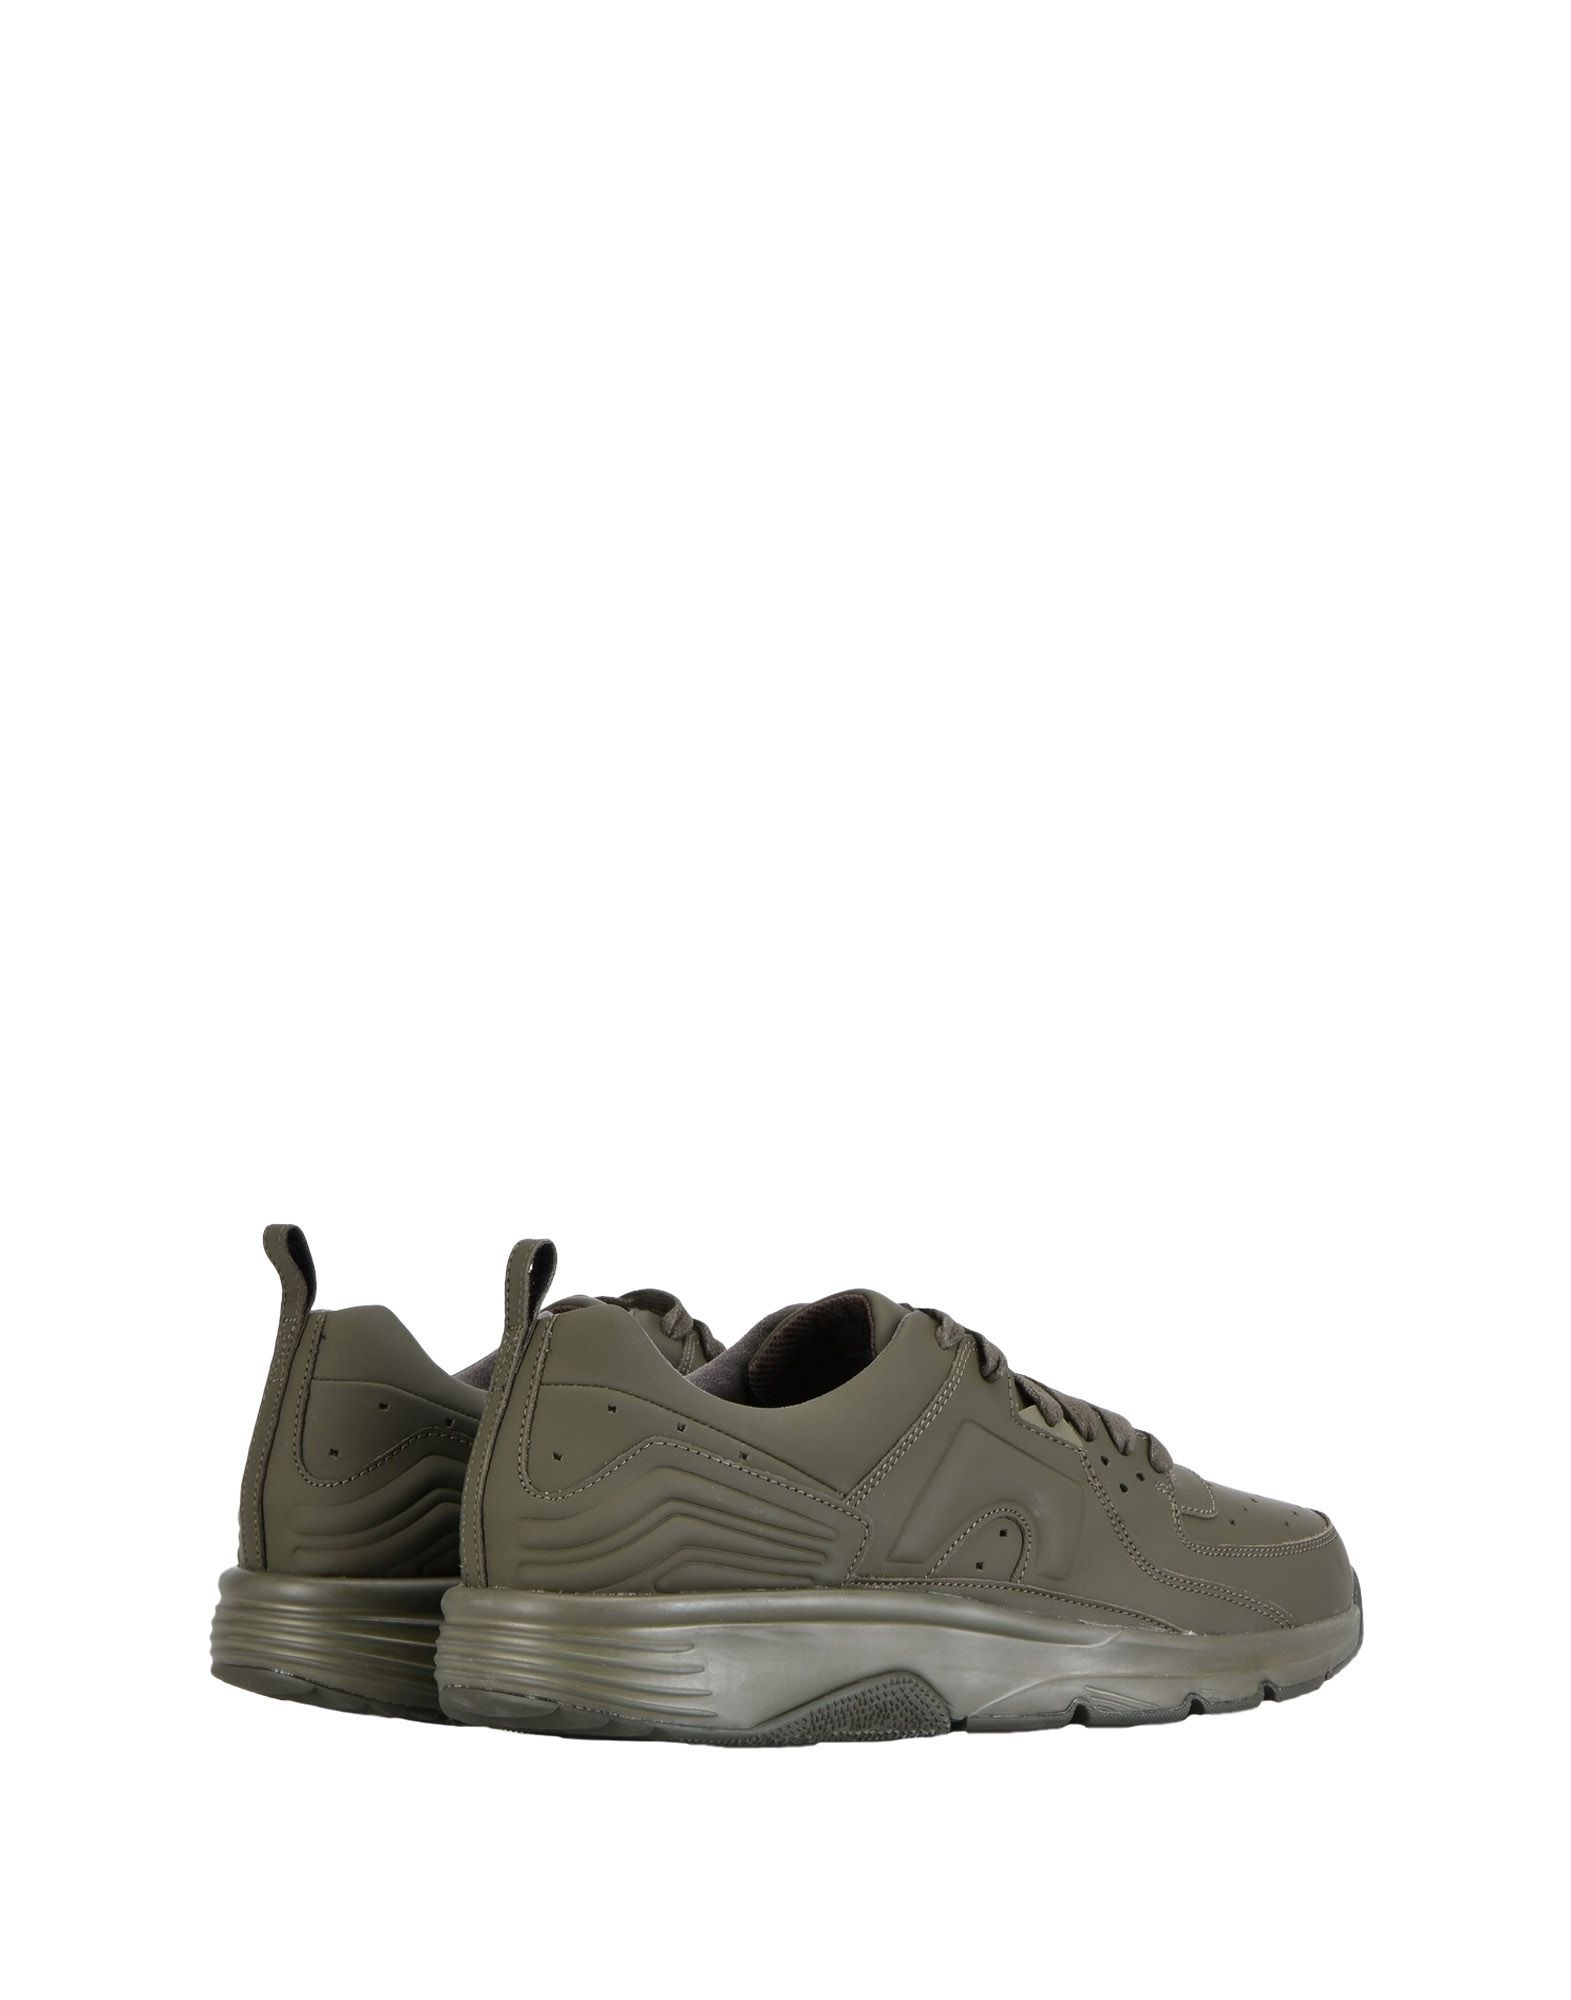 Camper Sneakers Herren  11356360MV Gute Qualität beliebte Schuhe